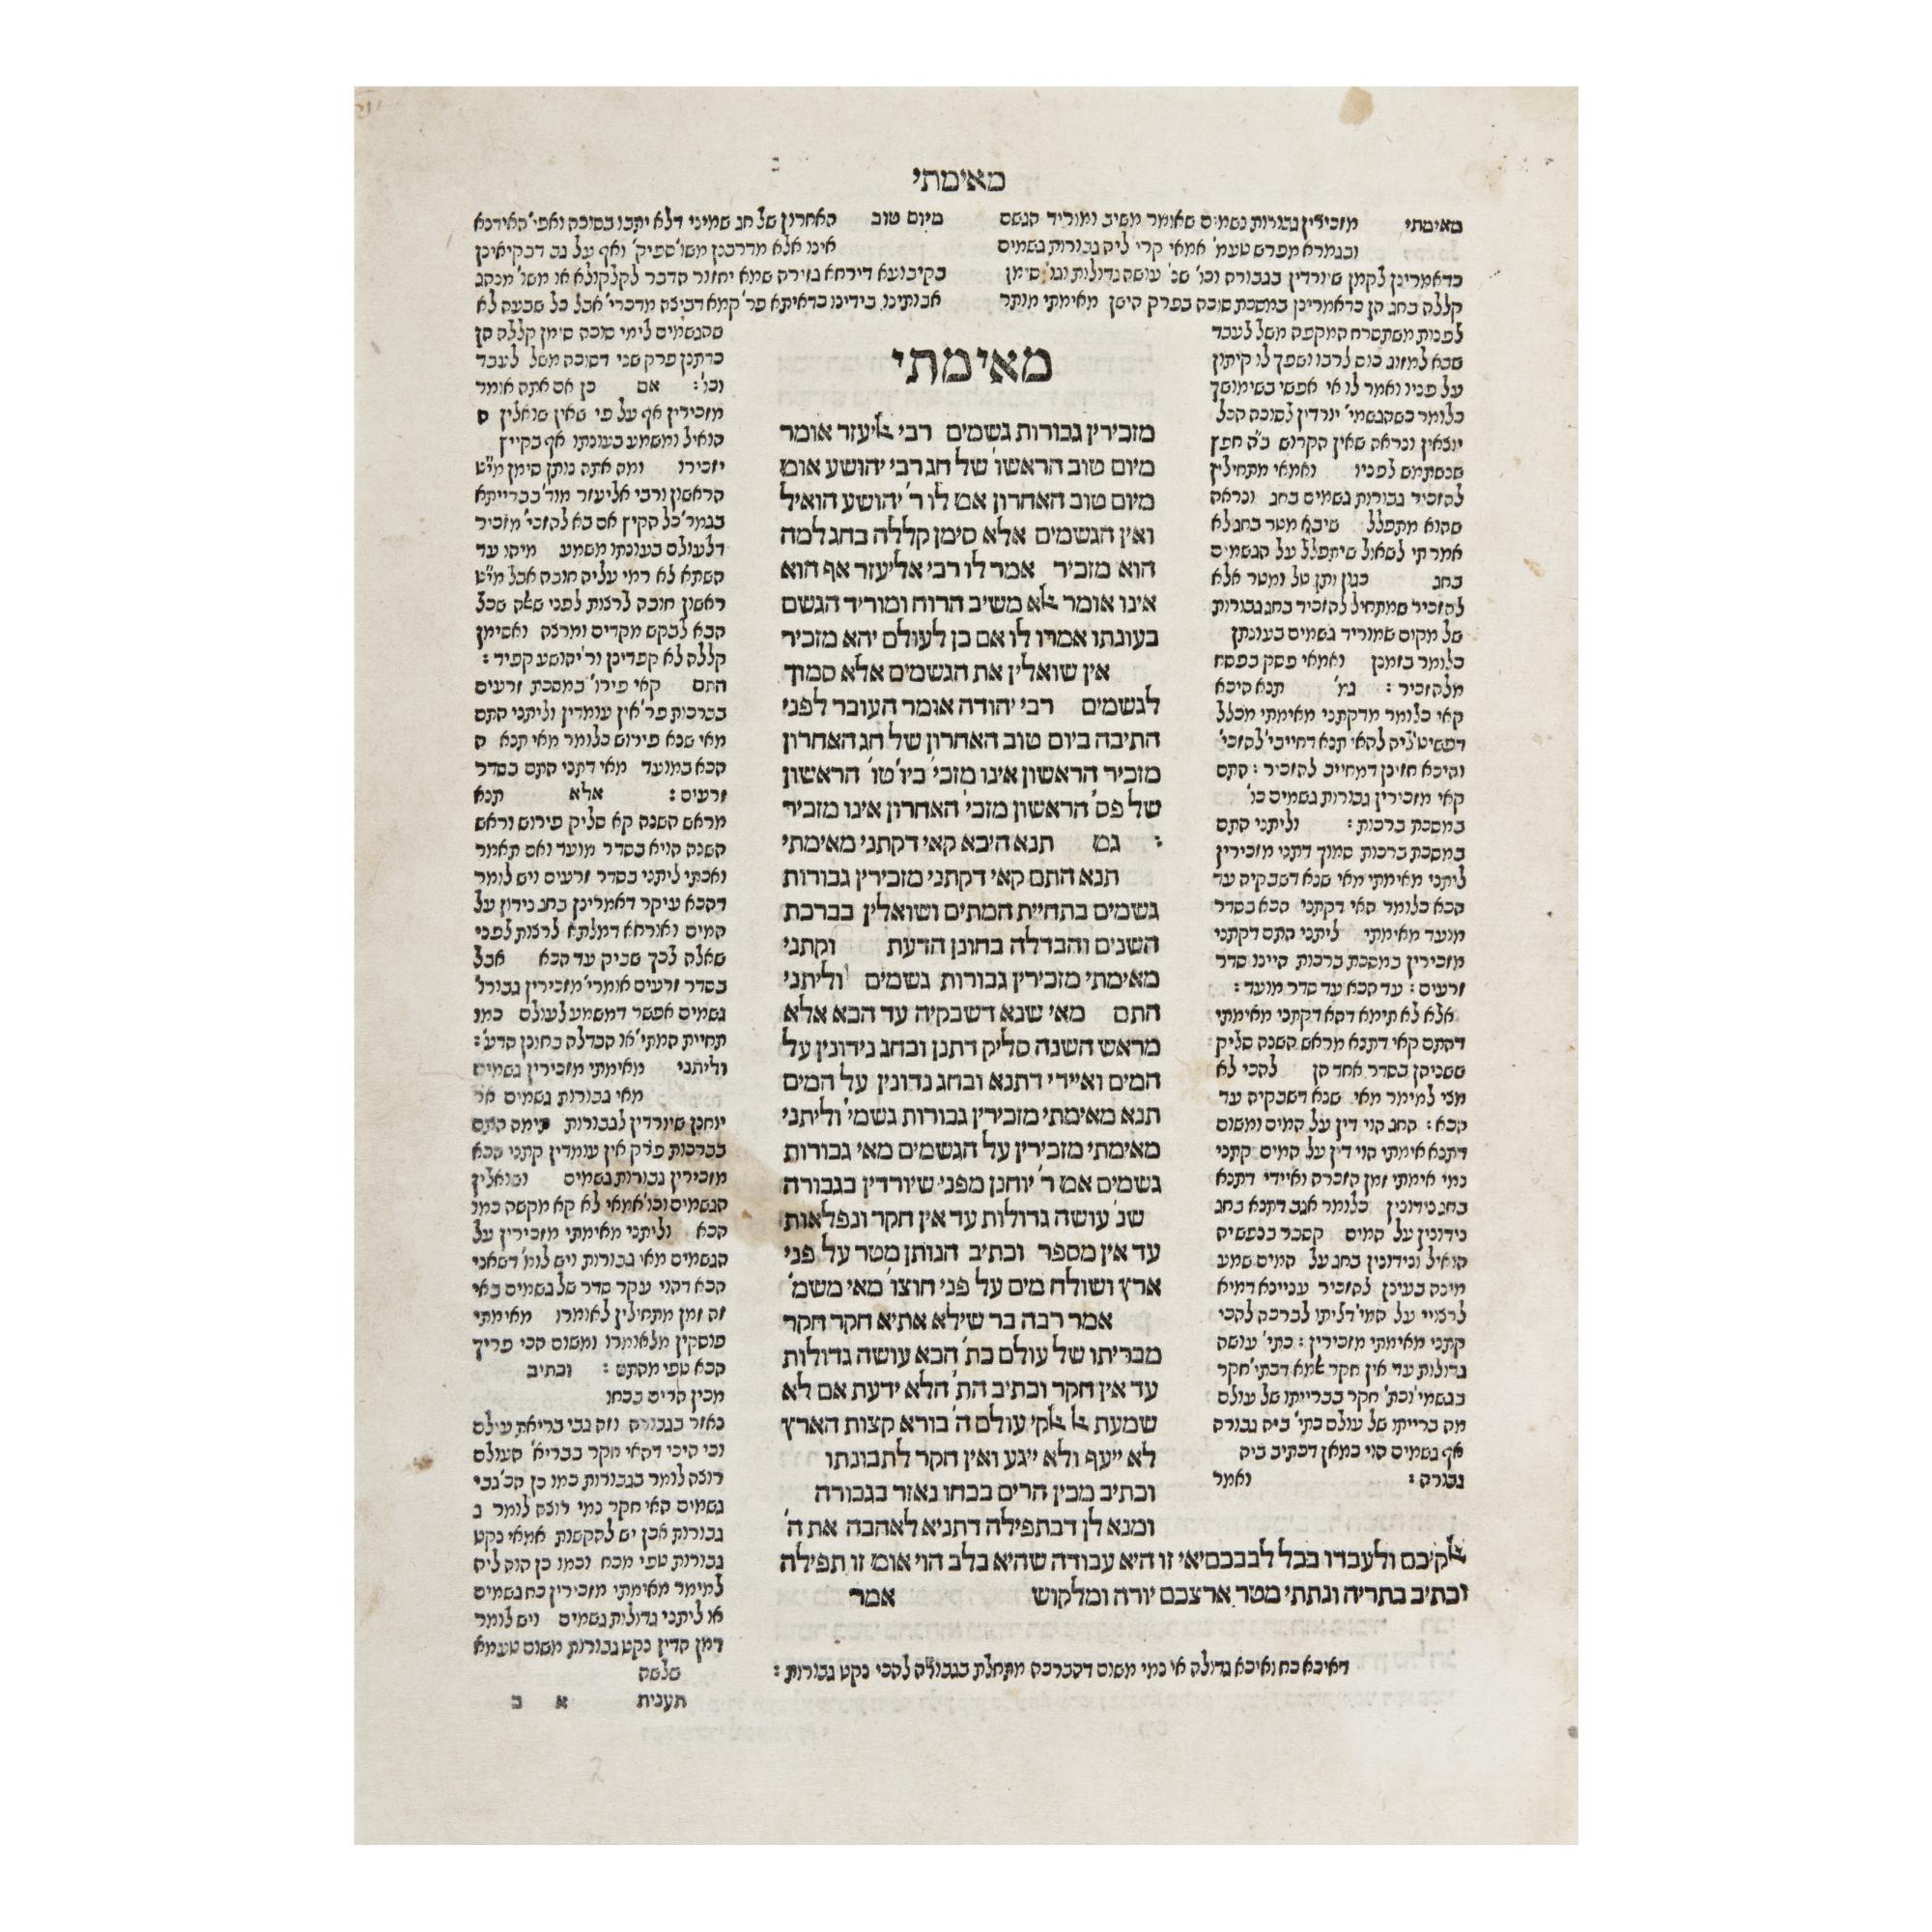 BABYLONIAN TALMUD, TRACTATE TA'ANIT, PESARO: [GERSHOM] SONCINO, [CA. 1514]